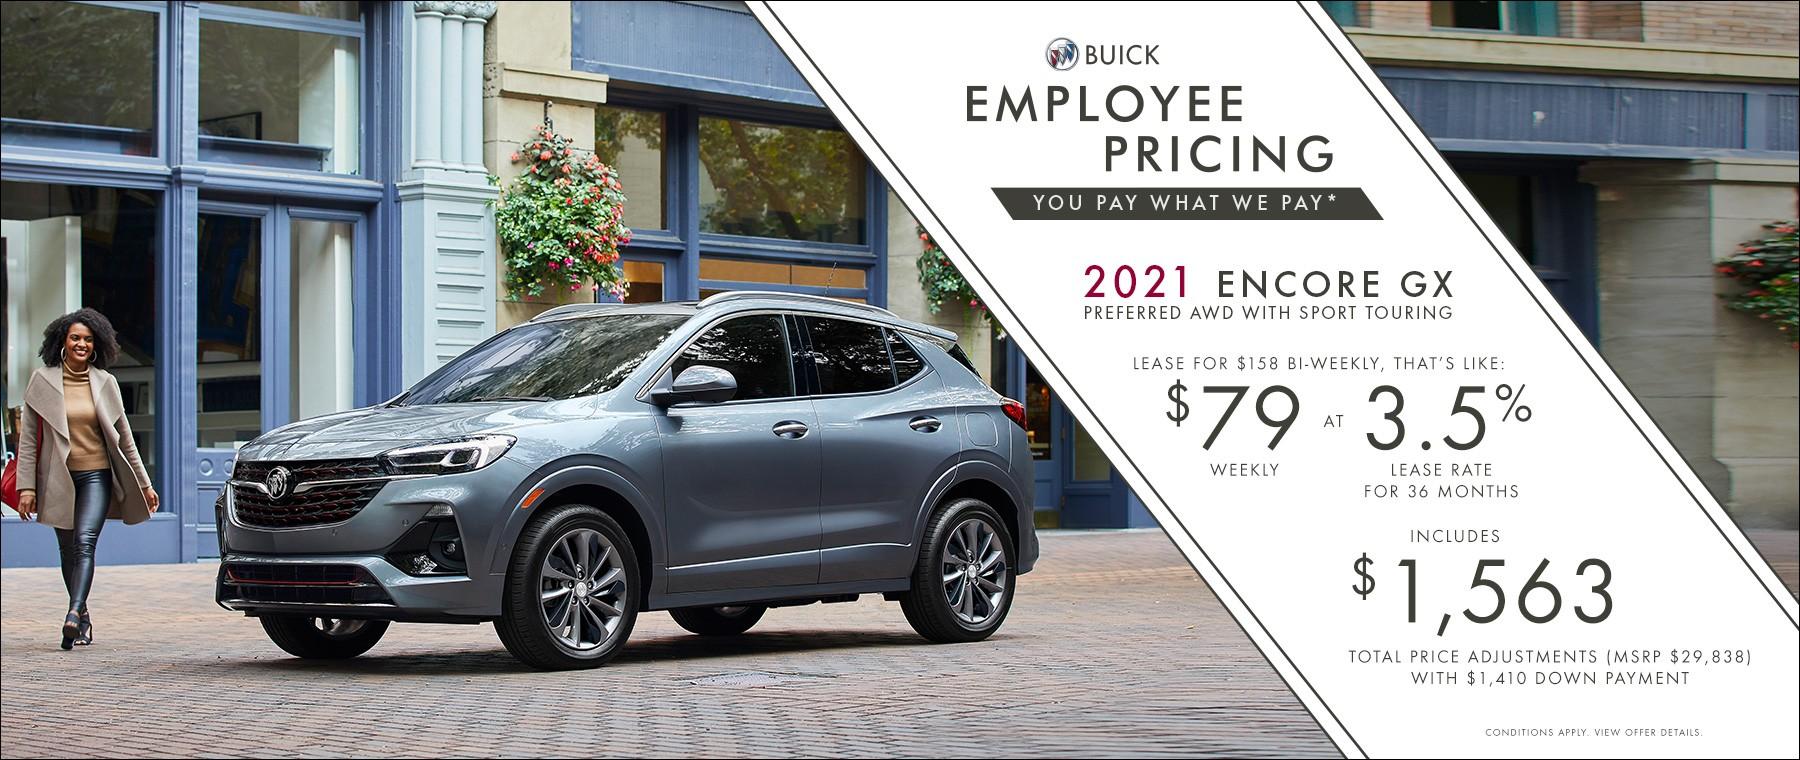 Employee Pricing – 2021 Encore GX Preferred AWD